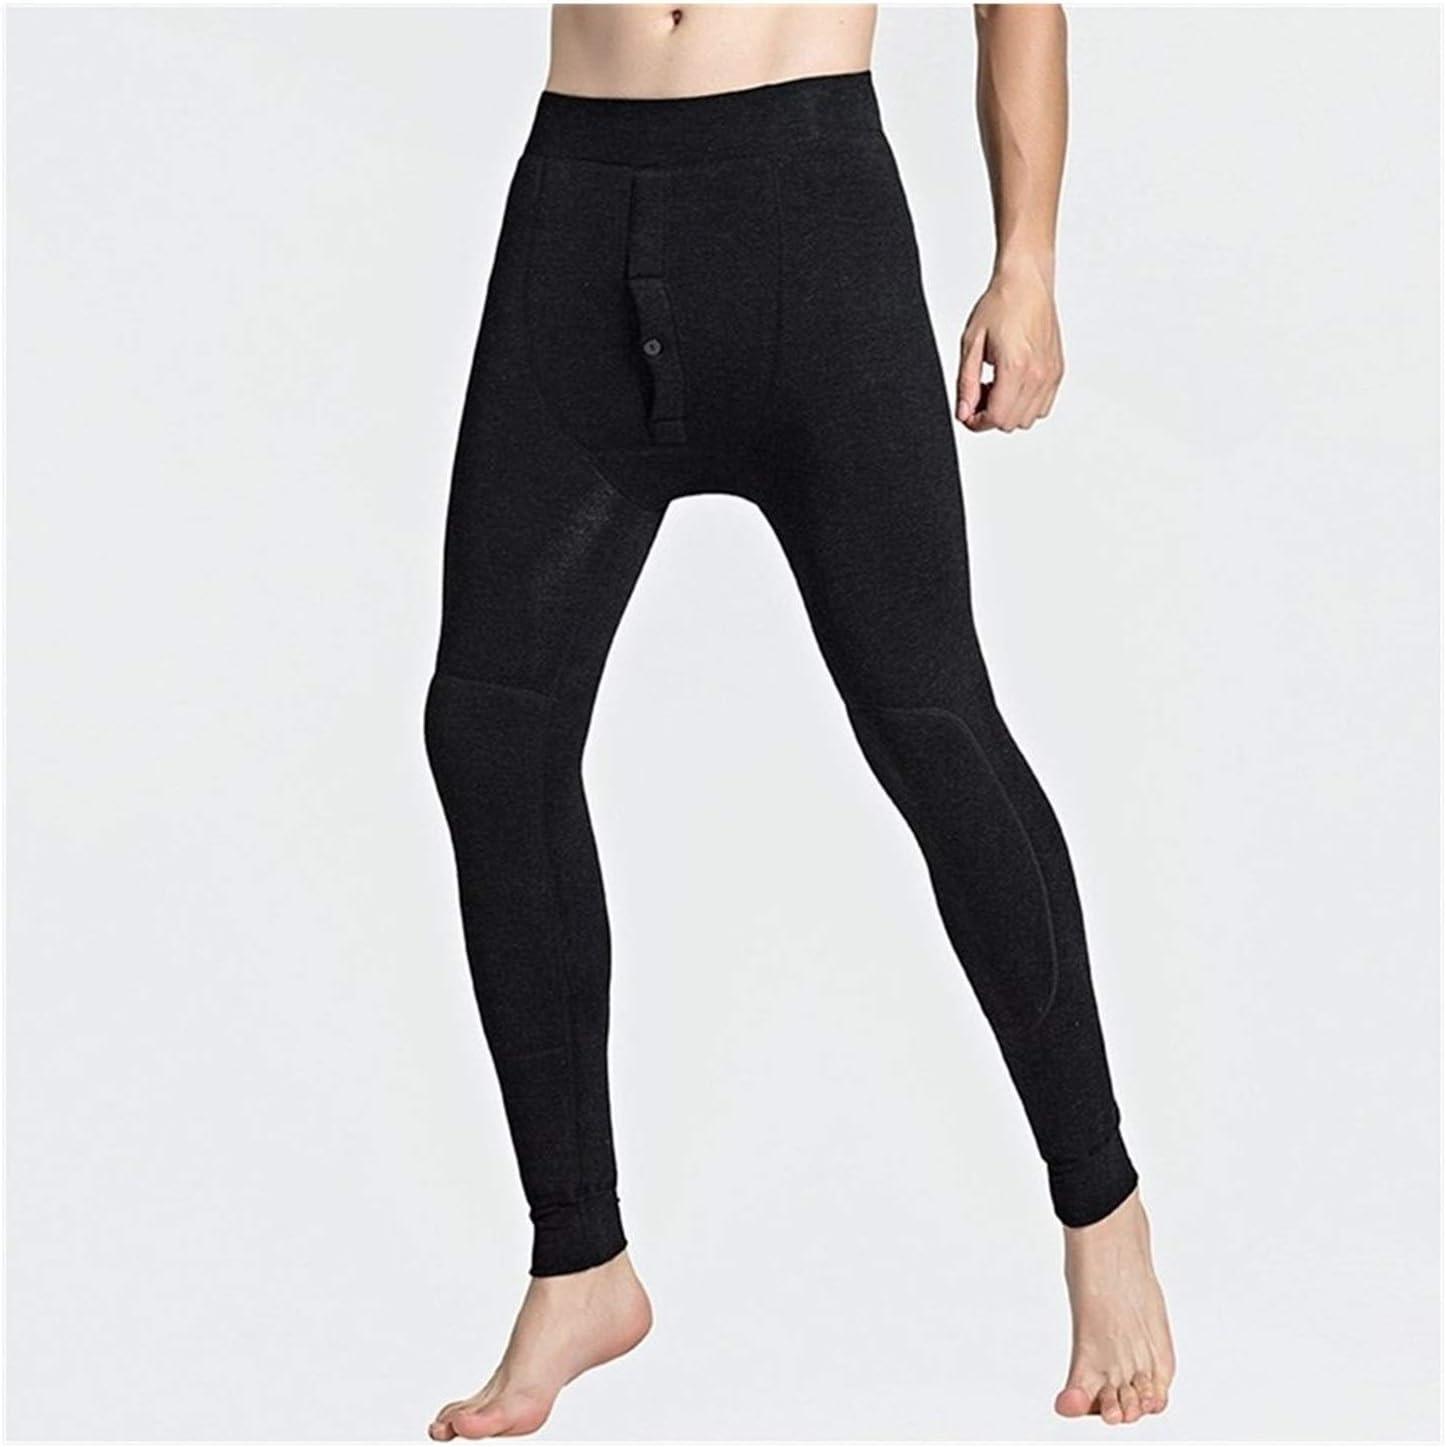 QWERBAM Below Zero 30 Degrees Super Warm Men's Leggings Winter Thermal Underwear Skinny Tights for Men Pants (Color : Black, Size : 4XL.)